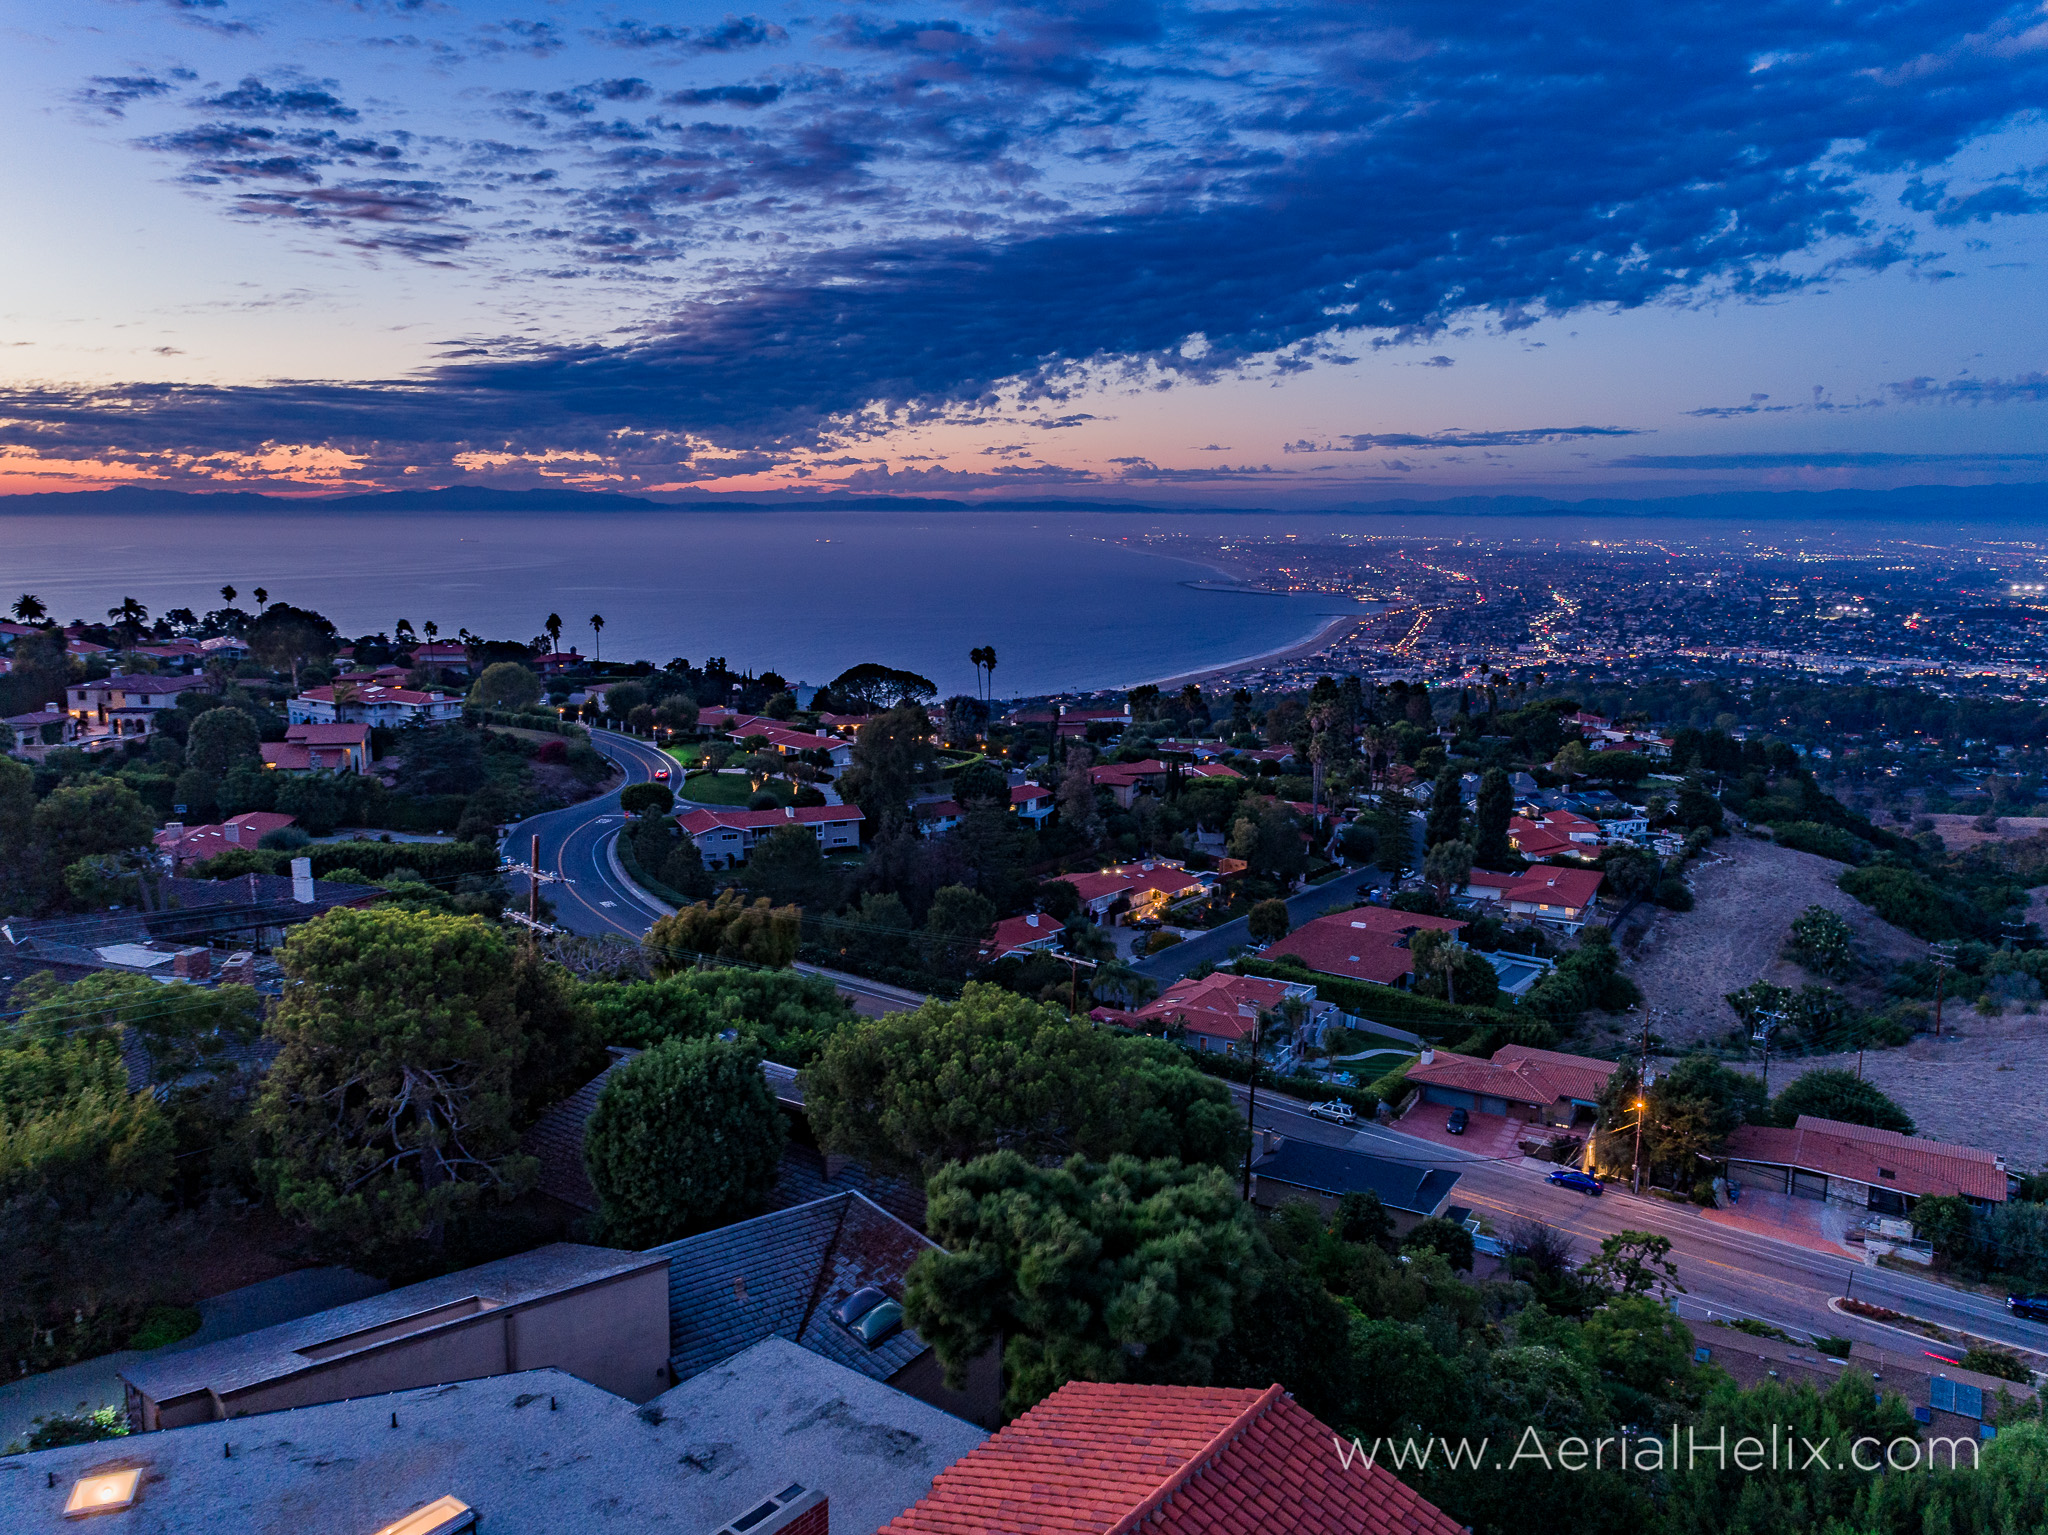 Woodfern Drive - HELIX Real Estate Aerial Photographer-33.jpg